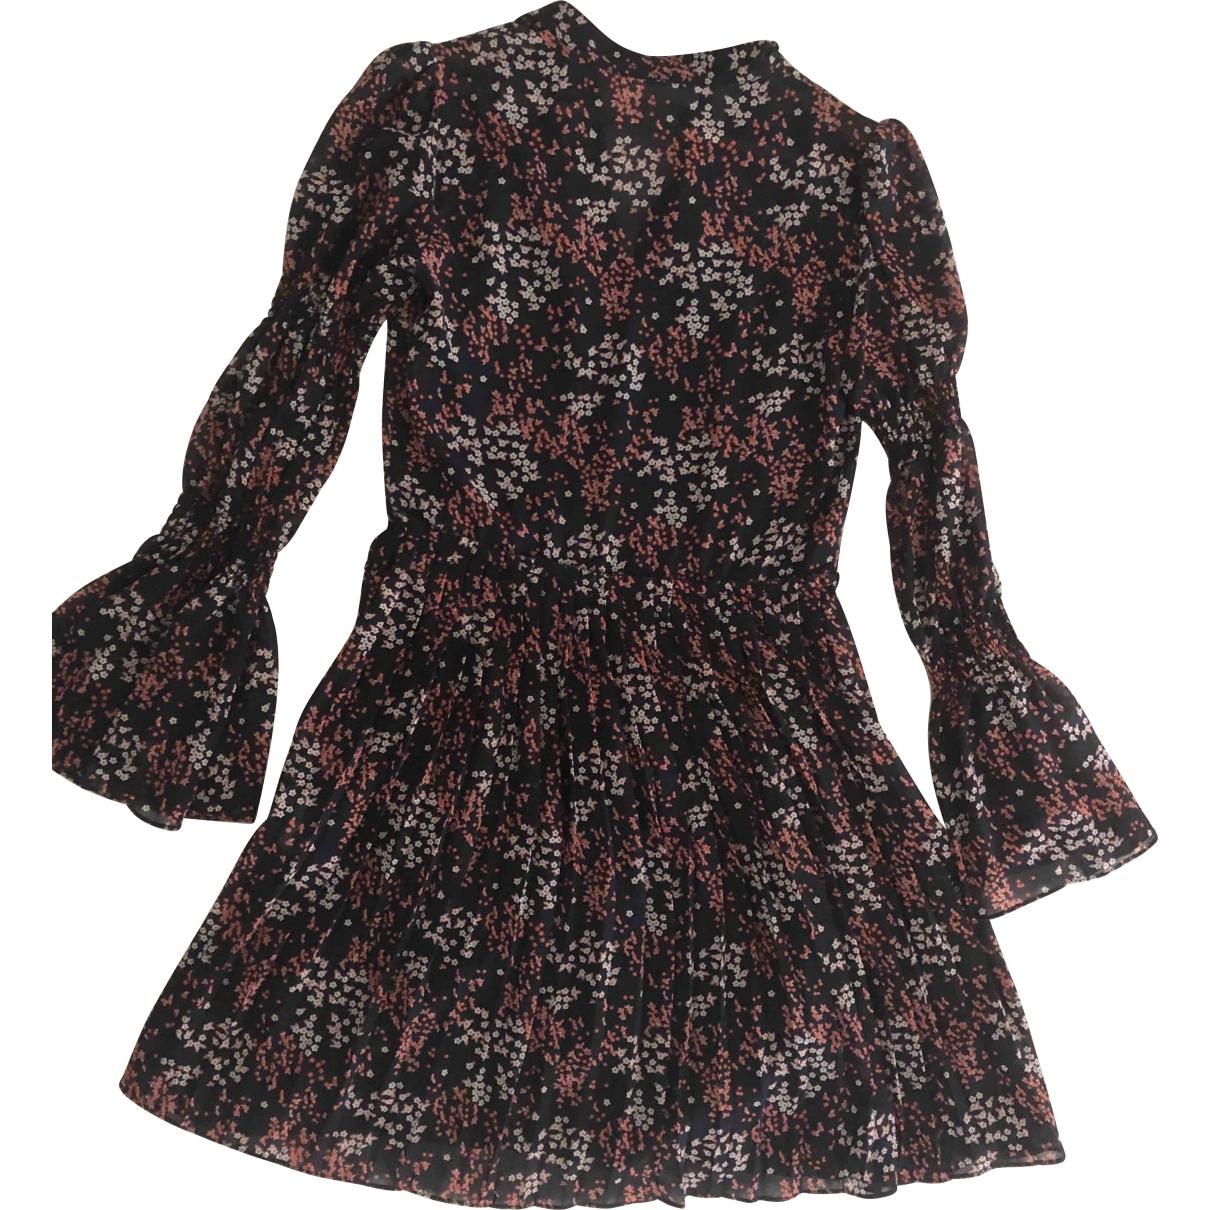 Michael Kors \N Purple dress for Women S International